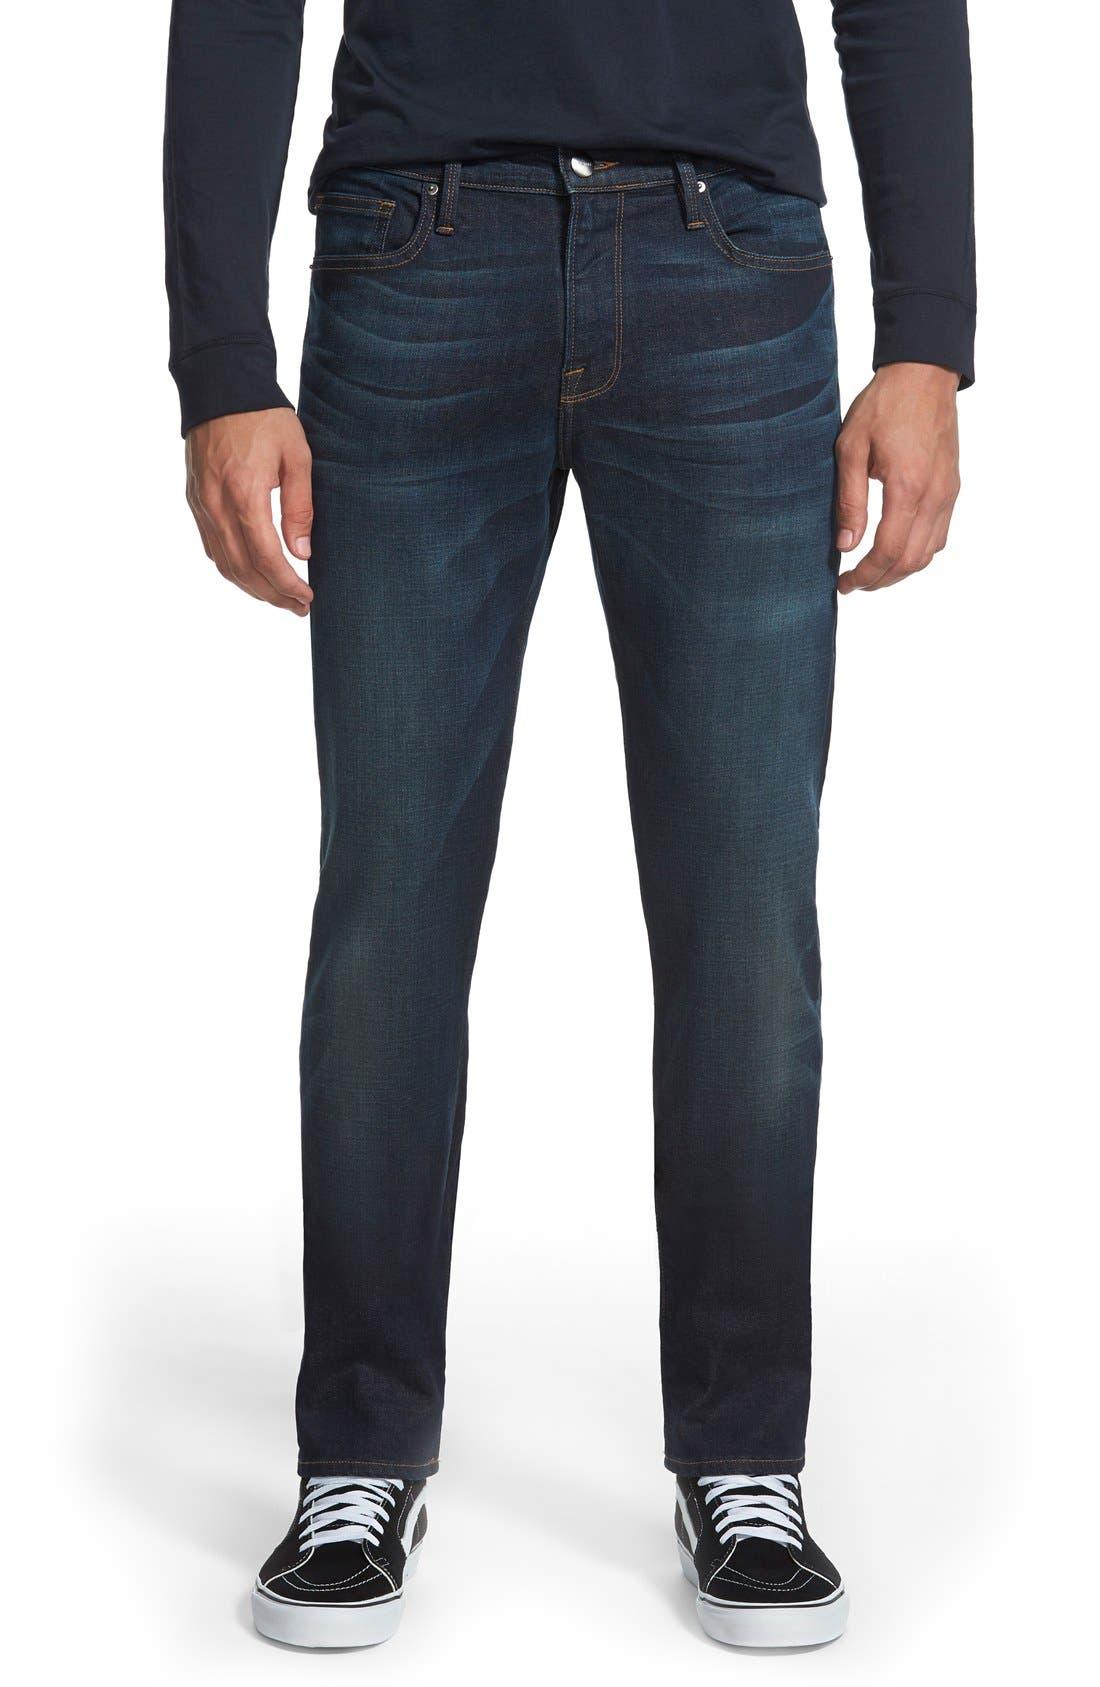 L'Homme Skinny Fit Jeans,                         Main,                         color, Sierra